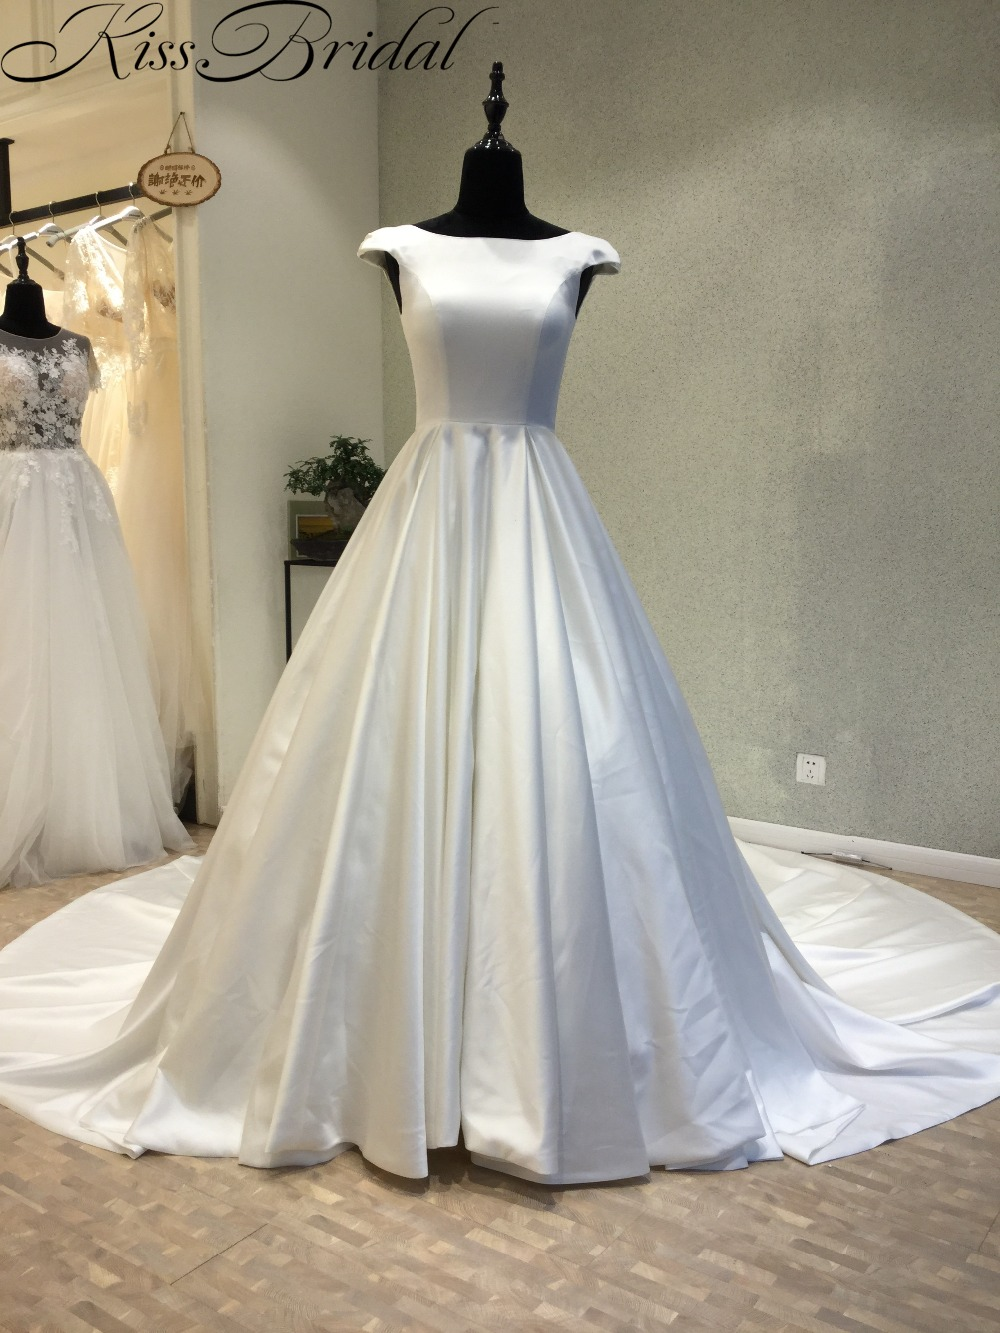 Vestido de noiva 2018 Stunning Wedding Dresses A line Corset Back Satin Cheap Bride Dress Robe de mariage